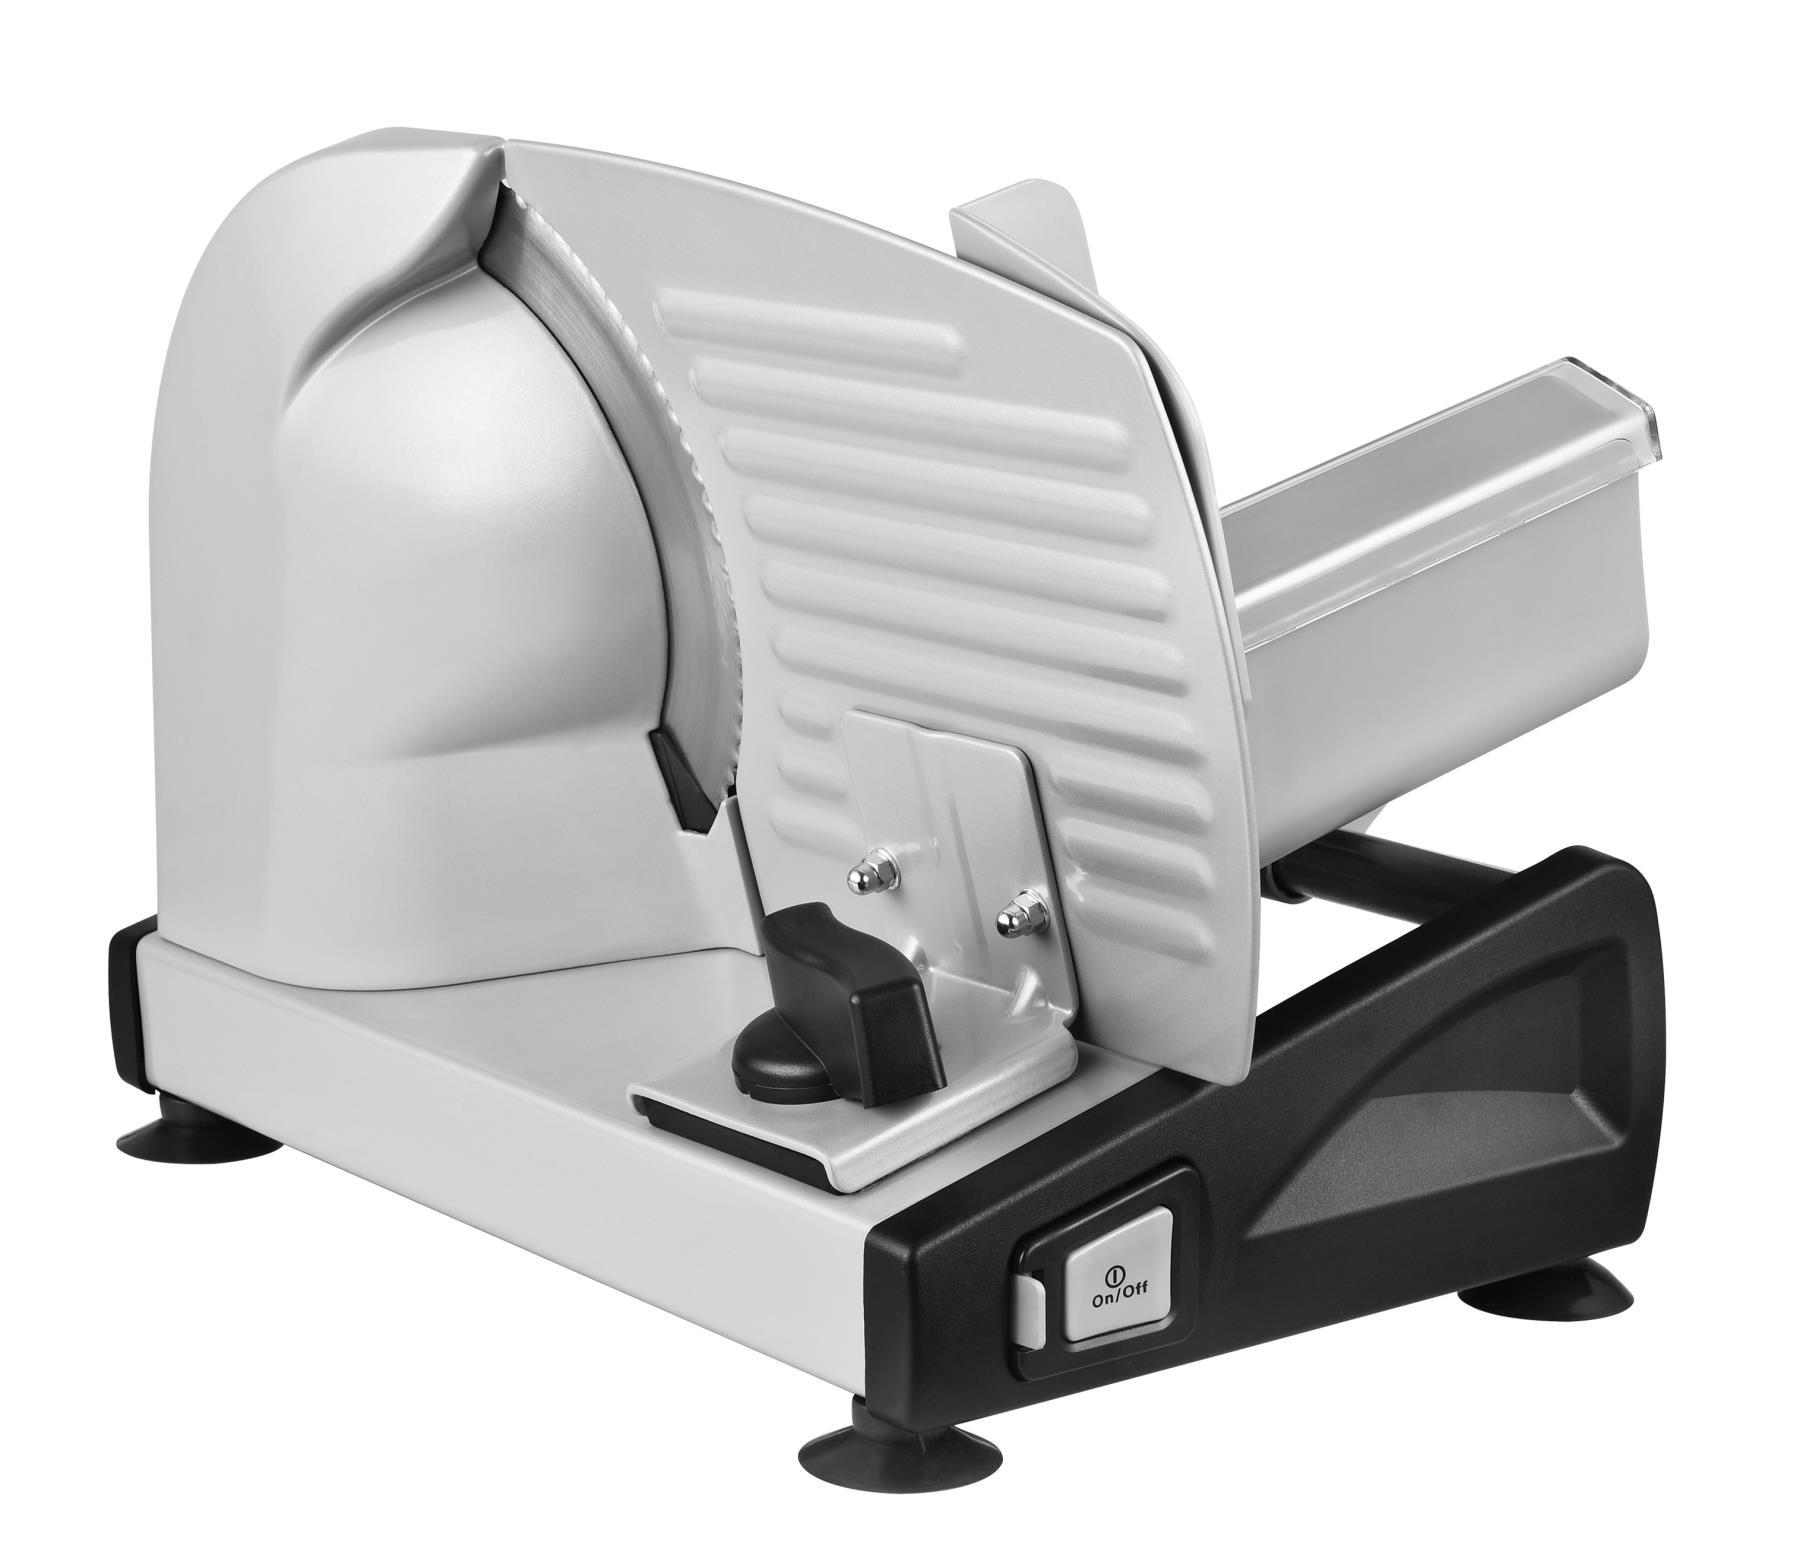 Metall Allesschneider Brotschneidemaschine Edelstahlmesser 19cm Silber*57918 003